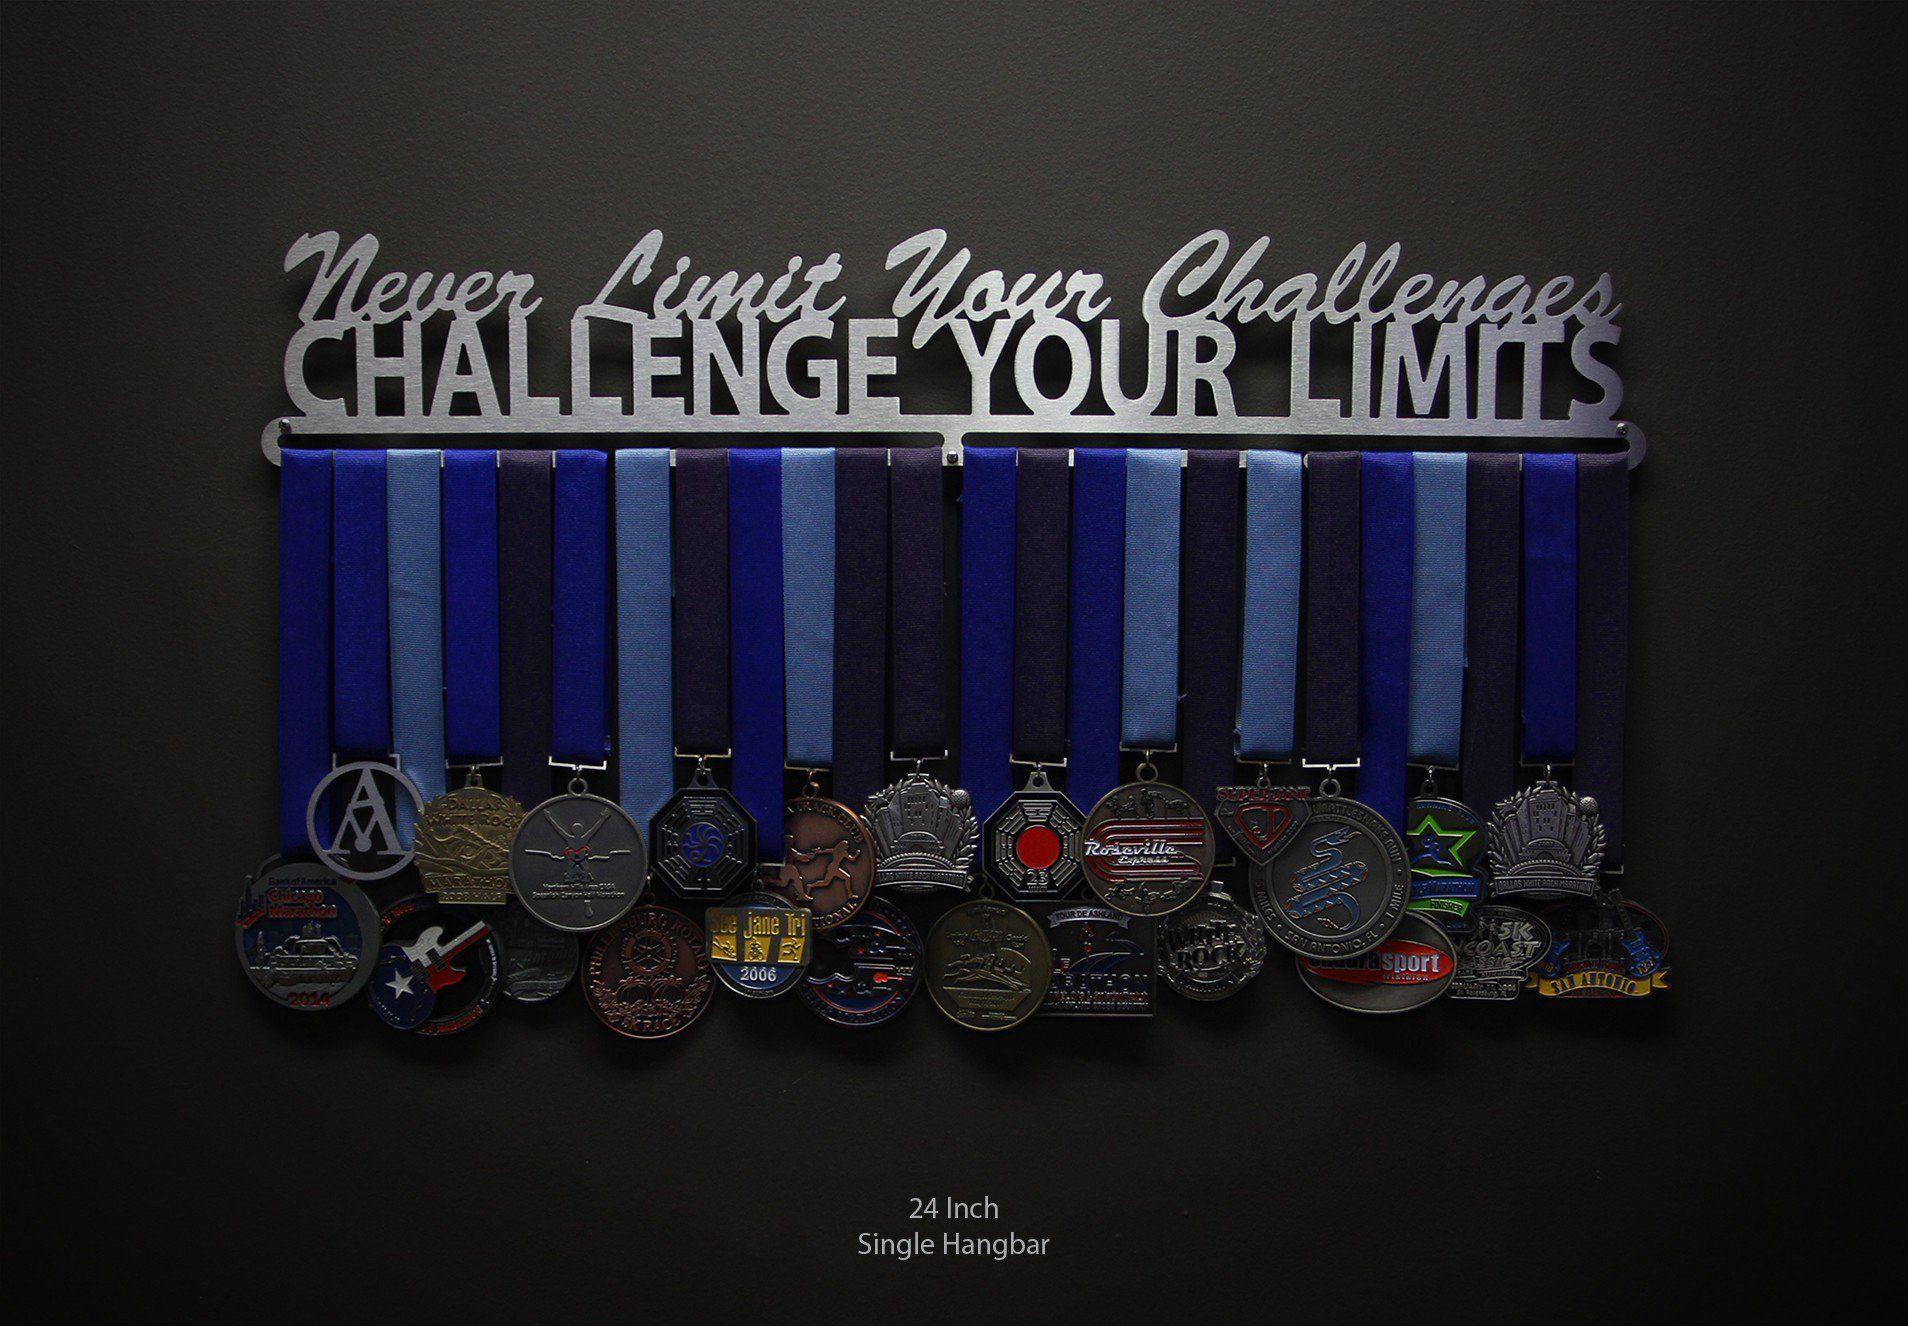 Medal Display UMDISPLAY triathlon Half Marathon run Marathon Ironman 39M